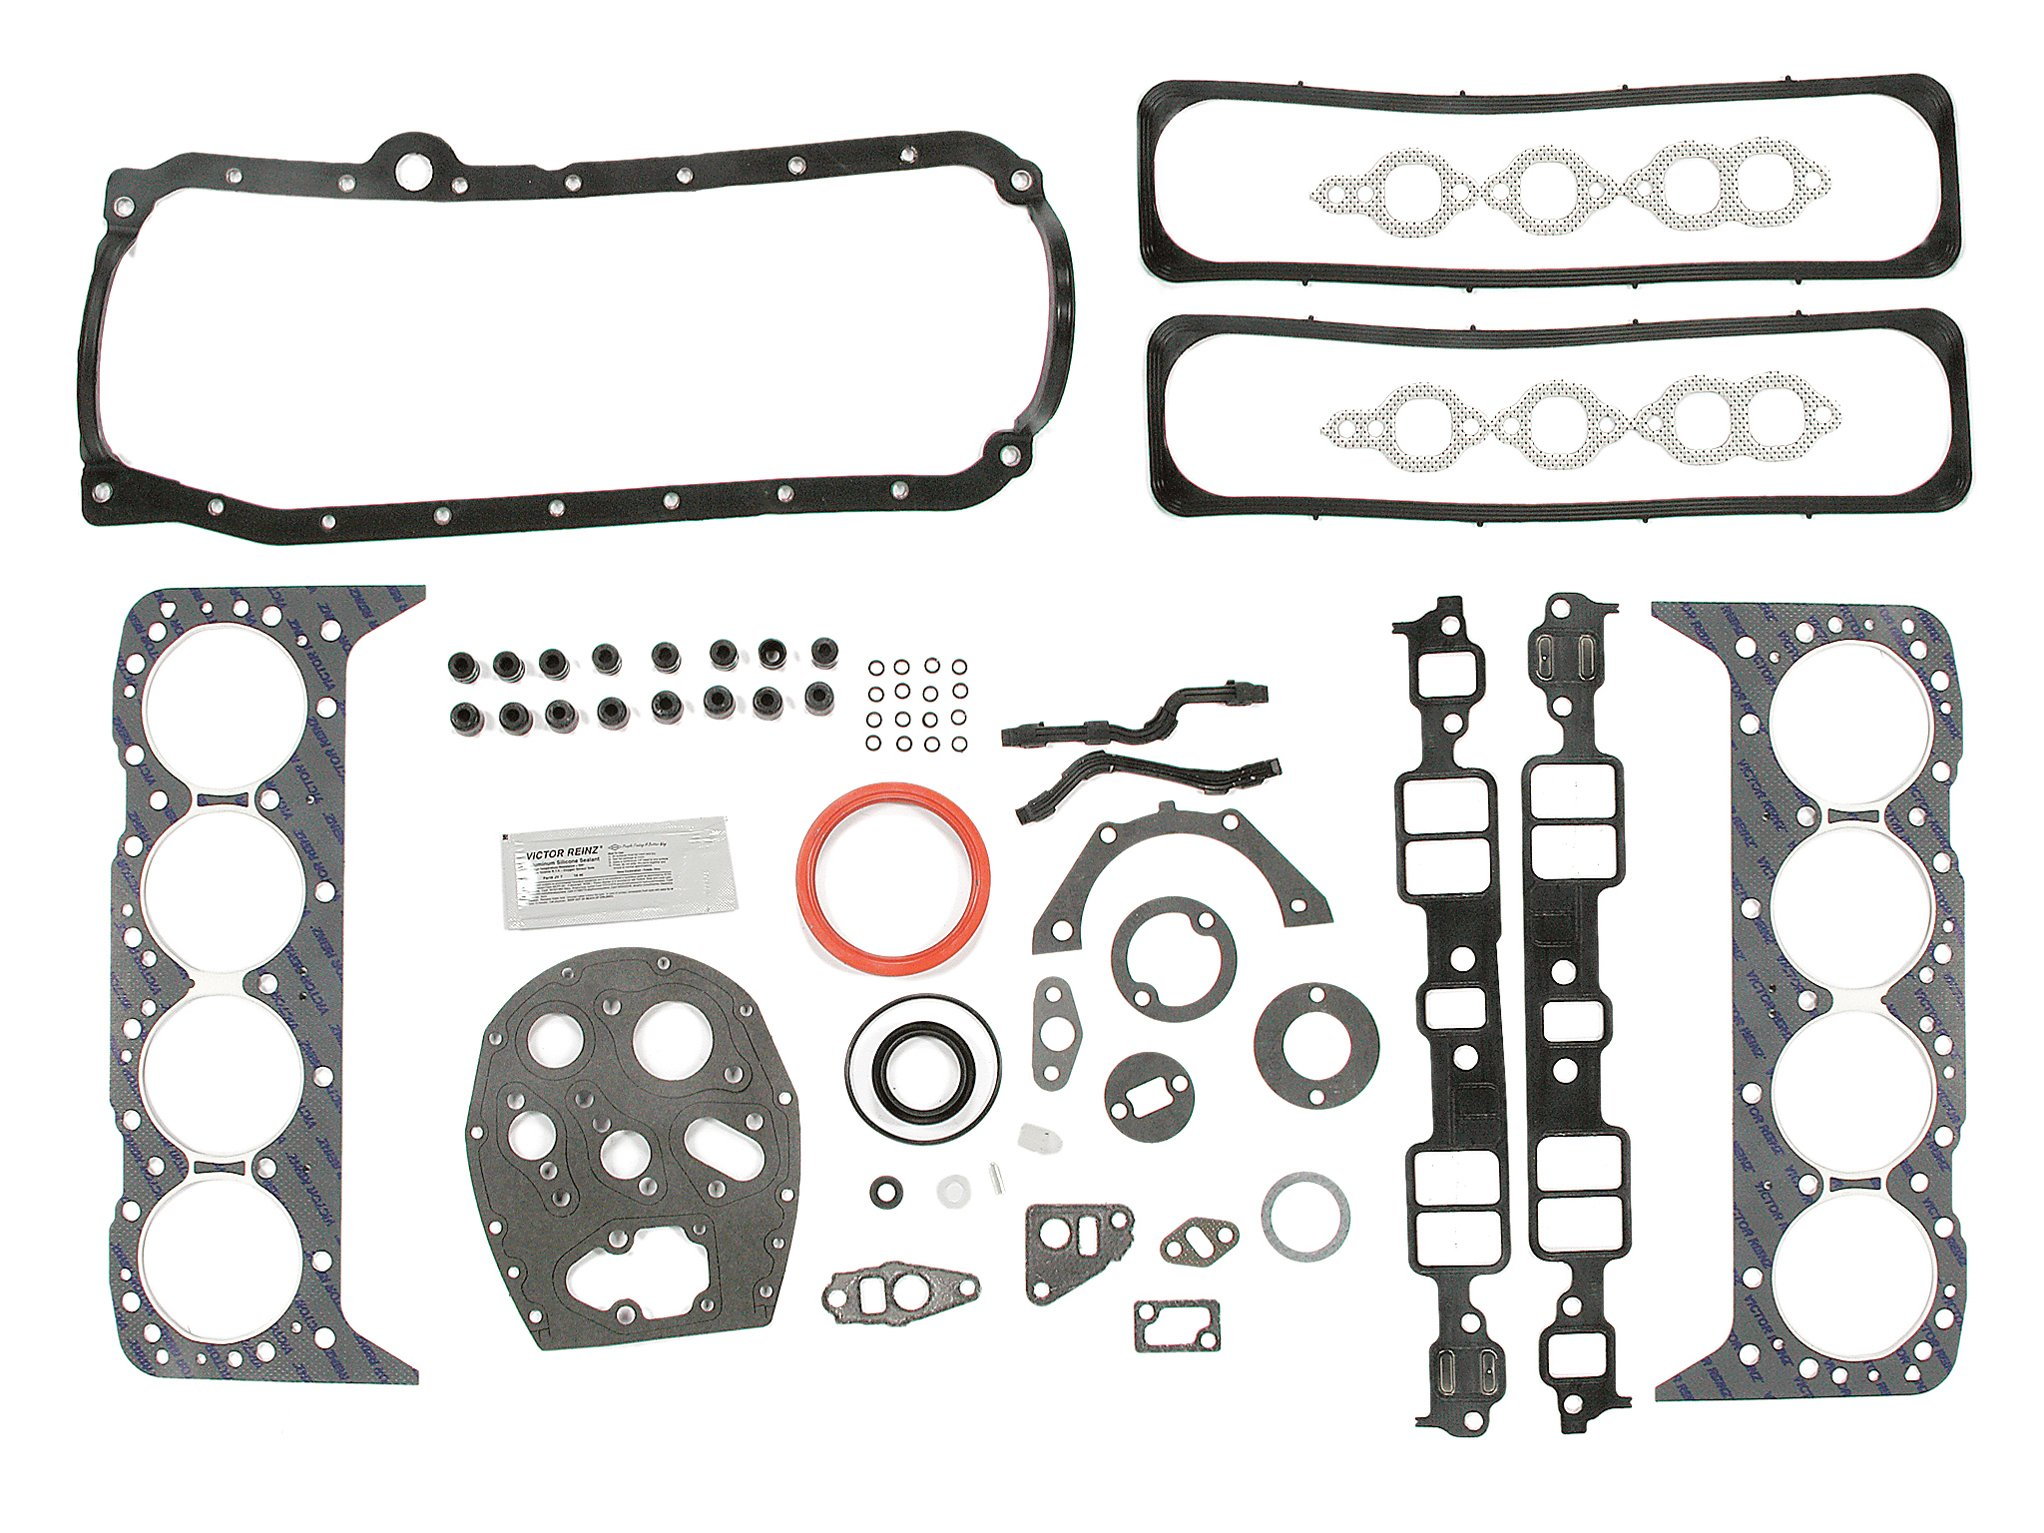 Mr Gasket 7146 Overhaul Gasket Kit Small Block Chevy 305